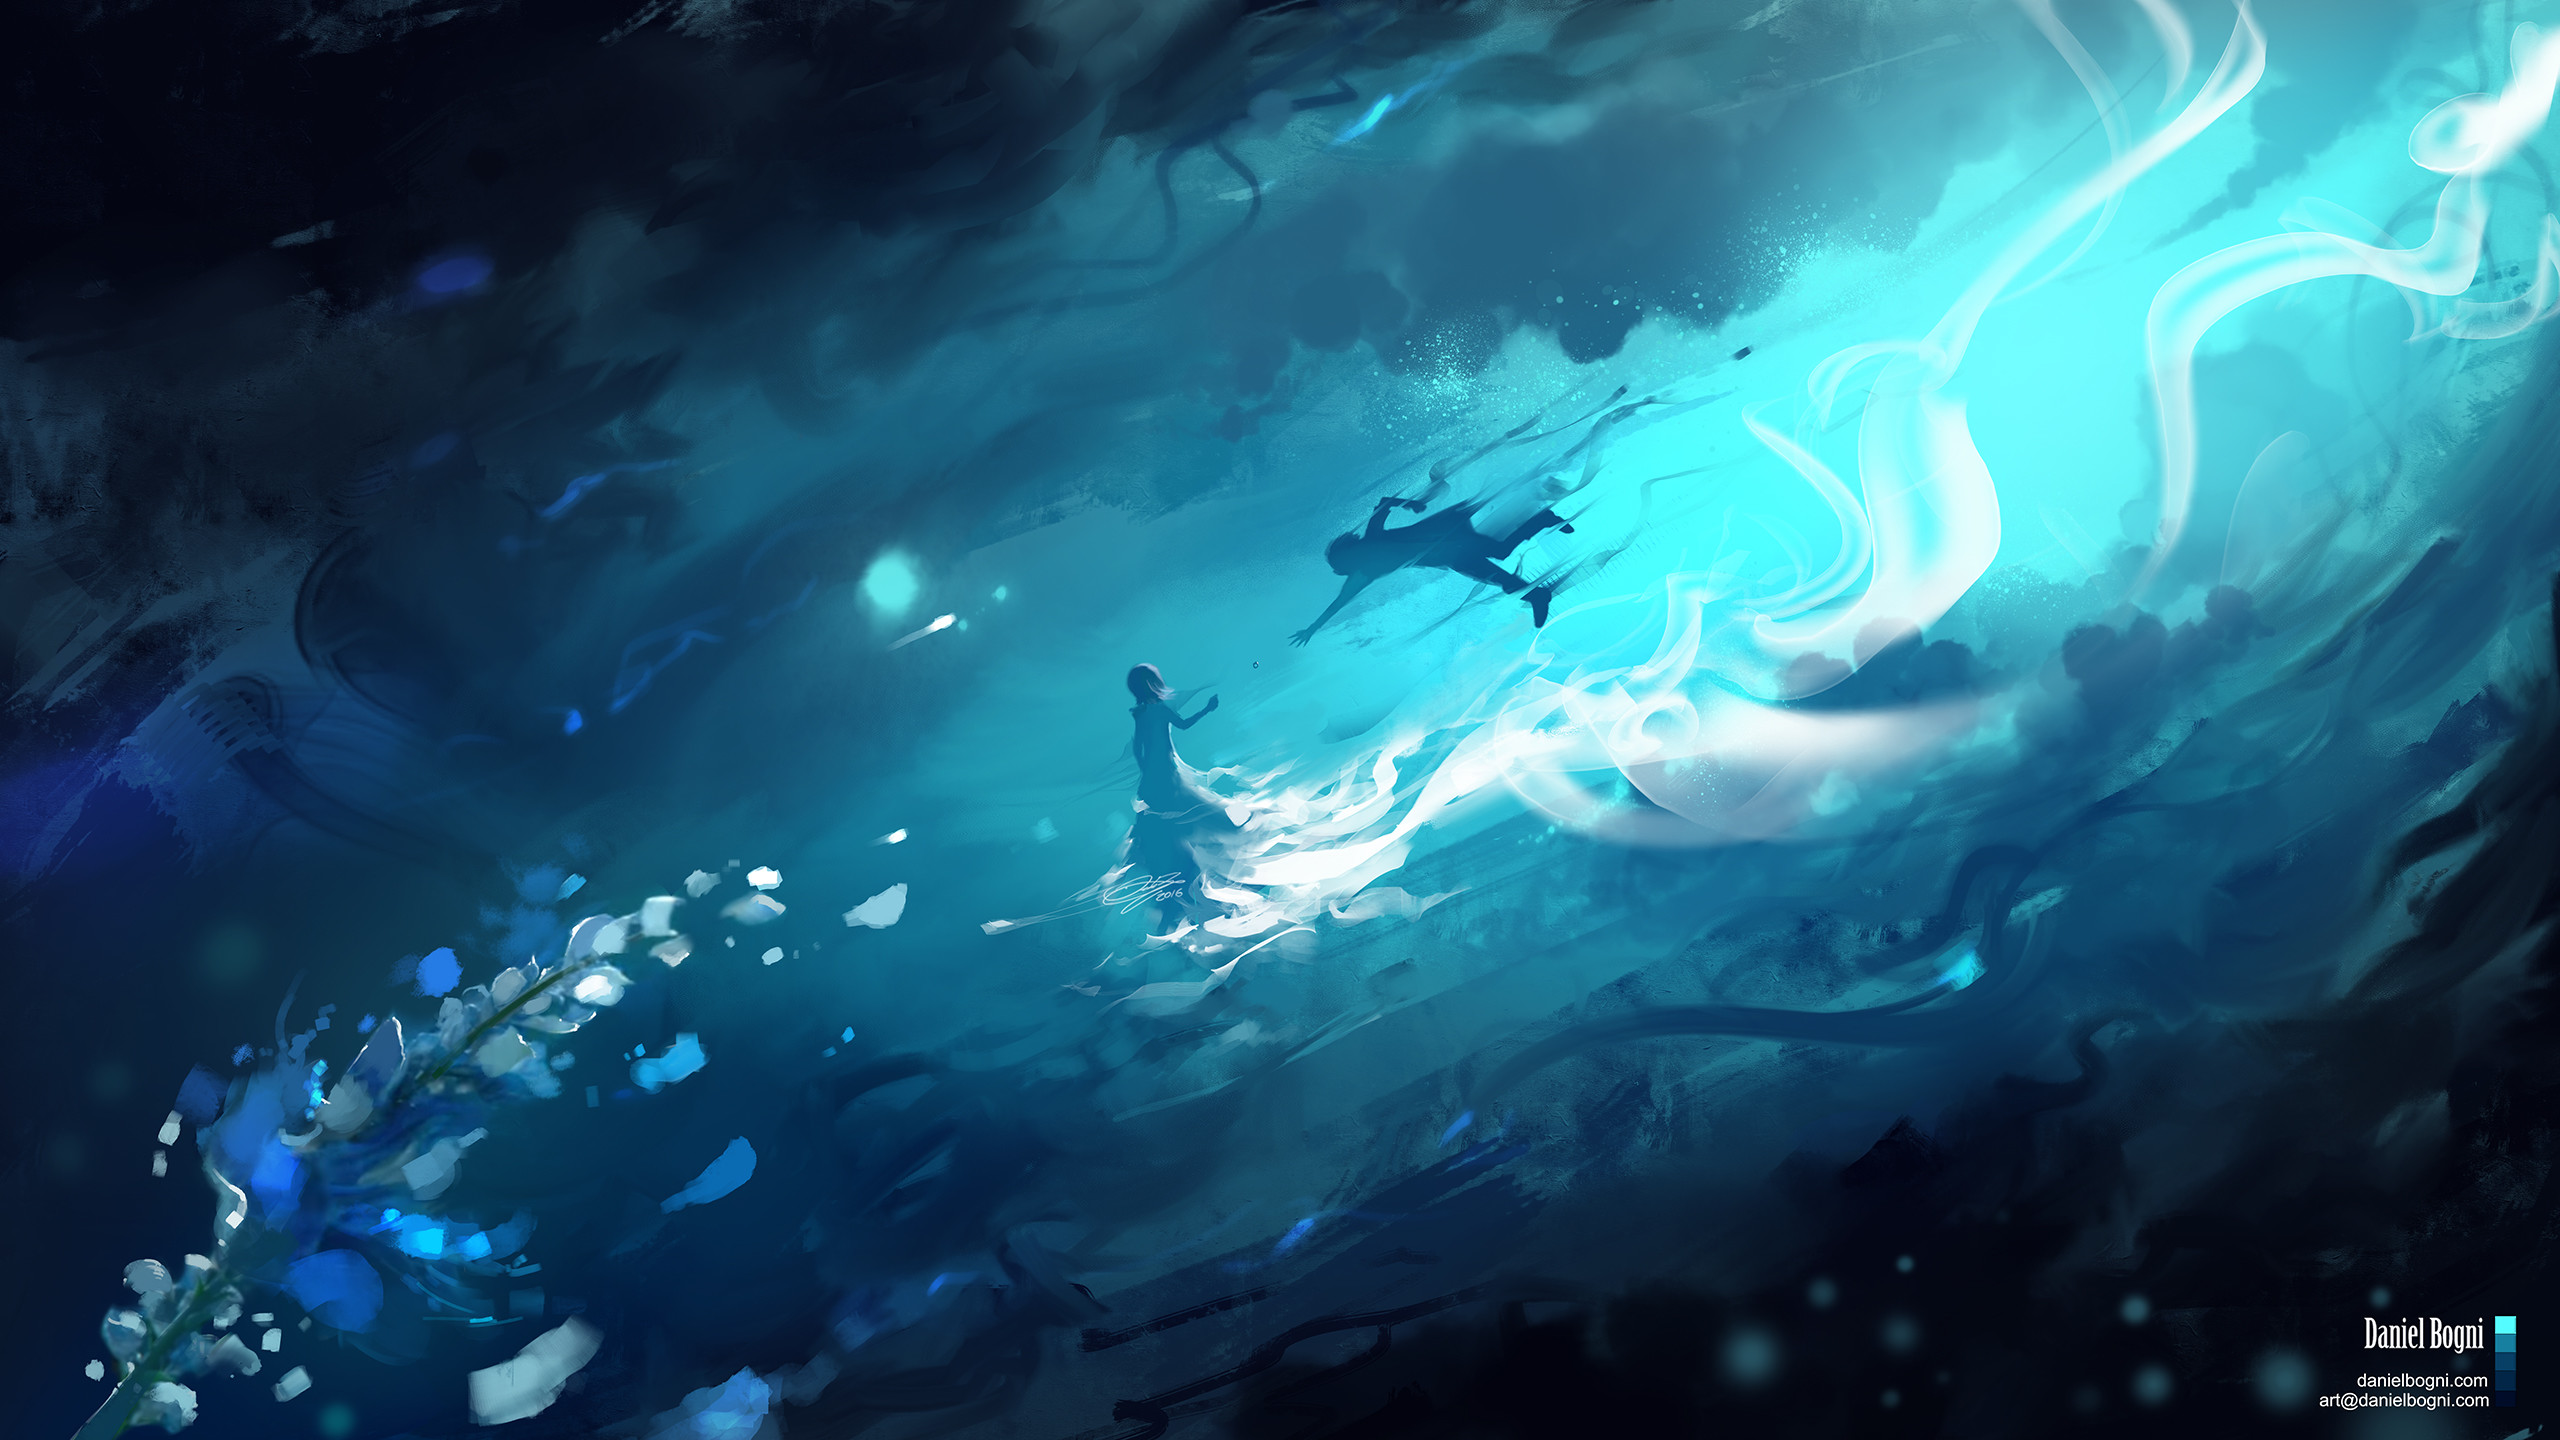 View Fullsize Final Fantasy XV Image